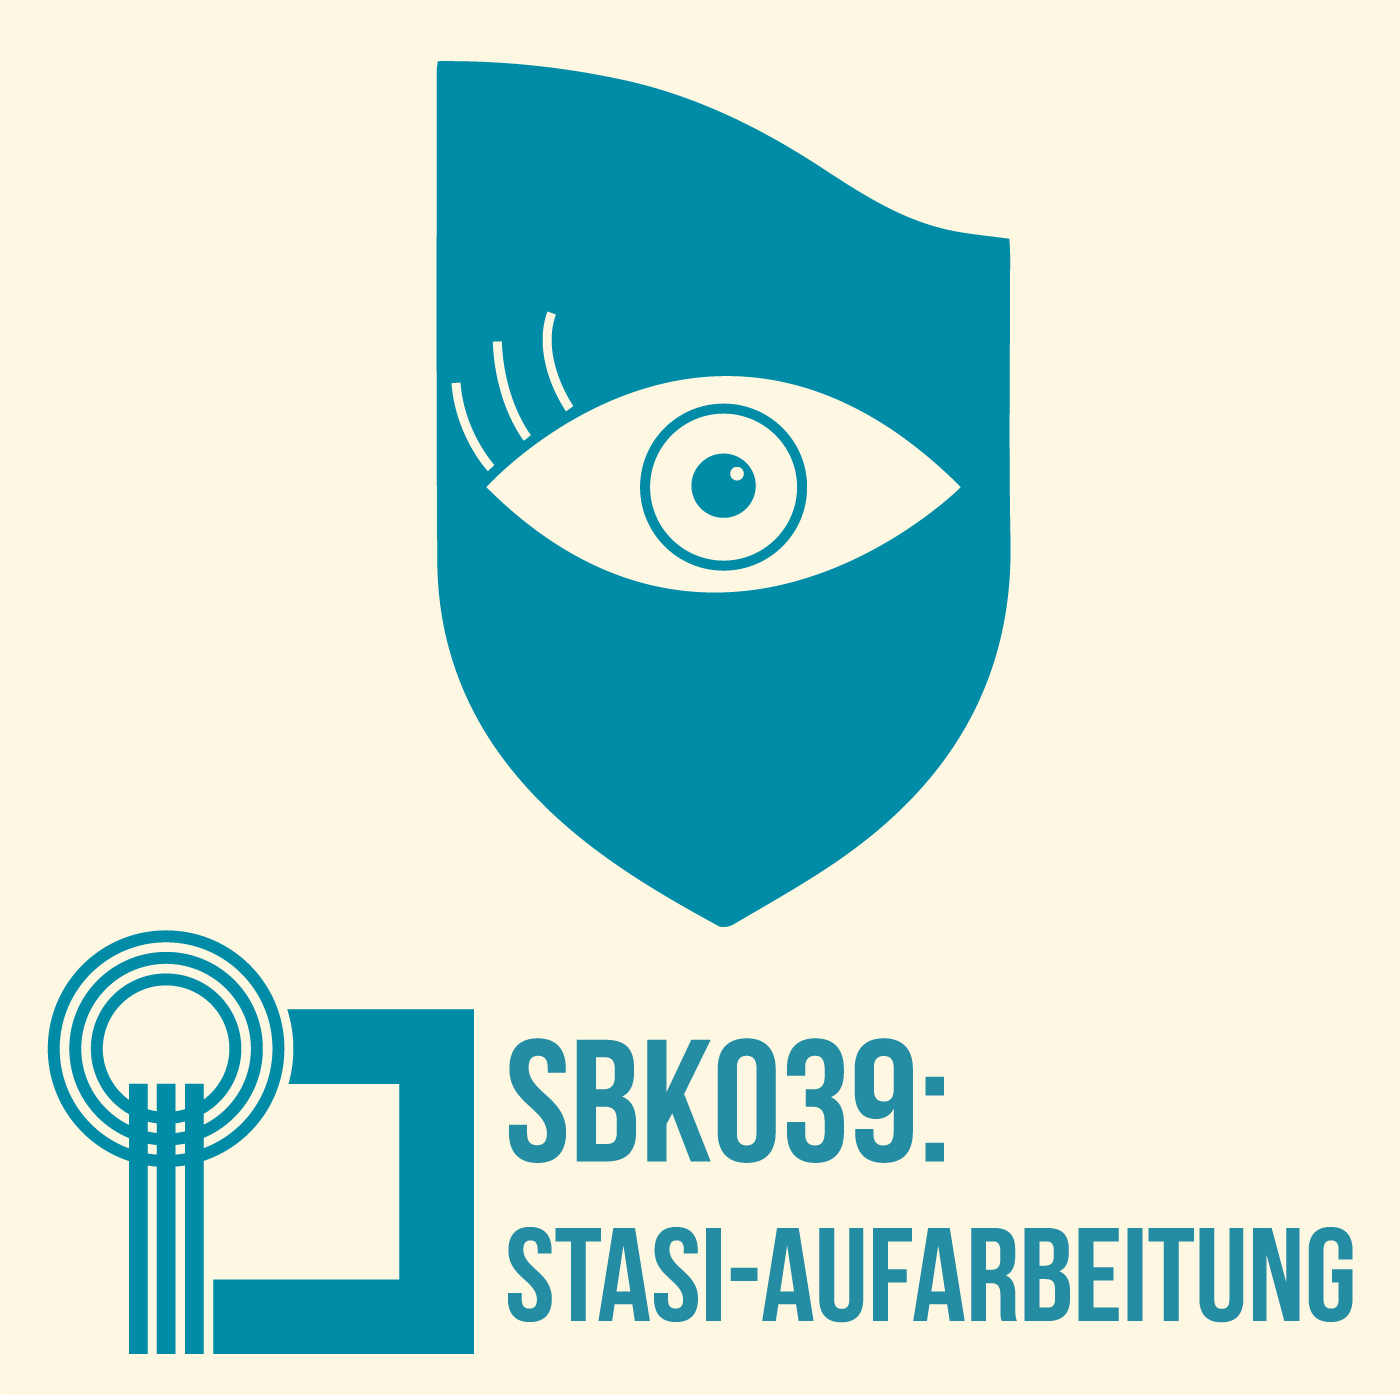 Stasi-Aufarbeitung